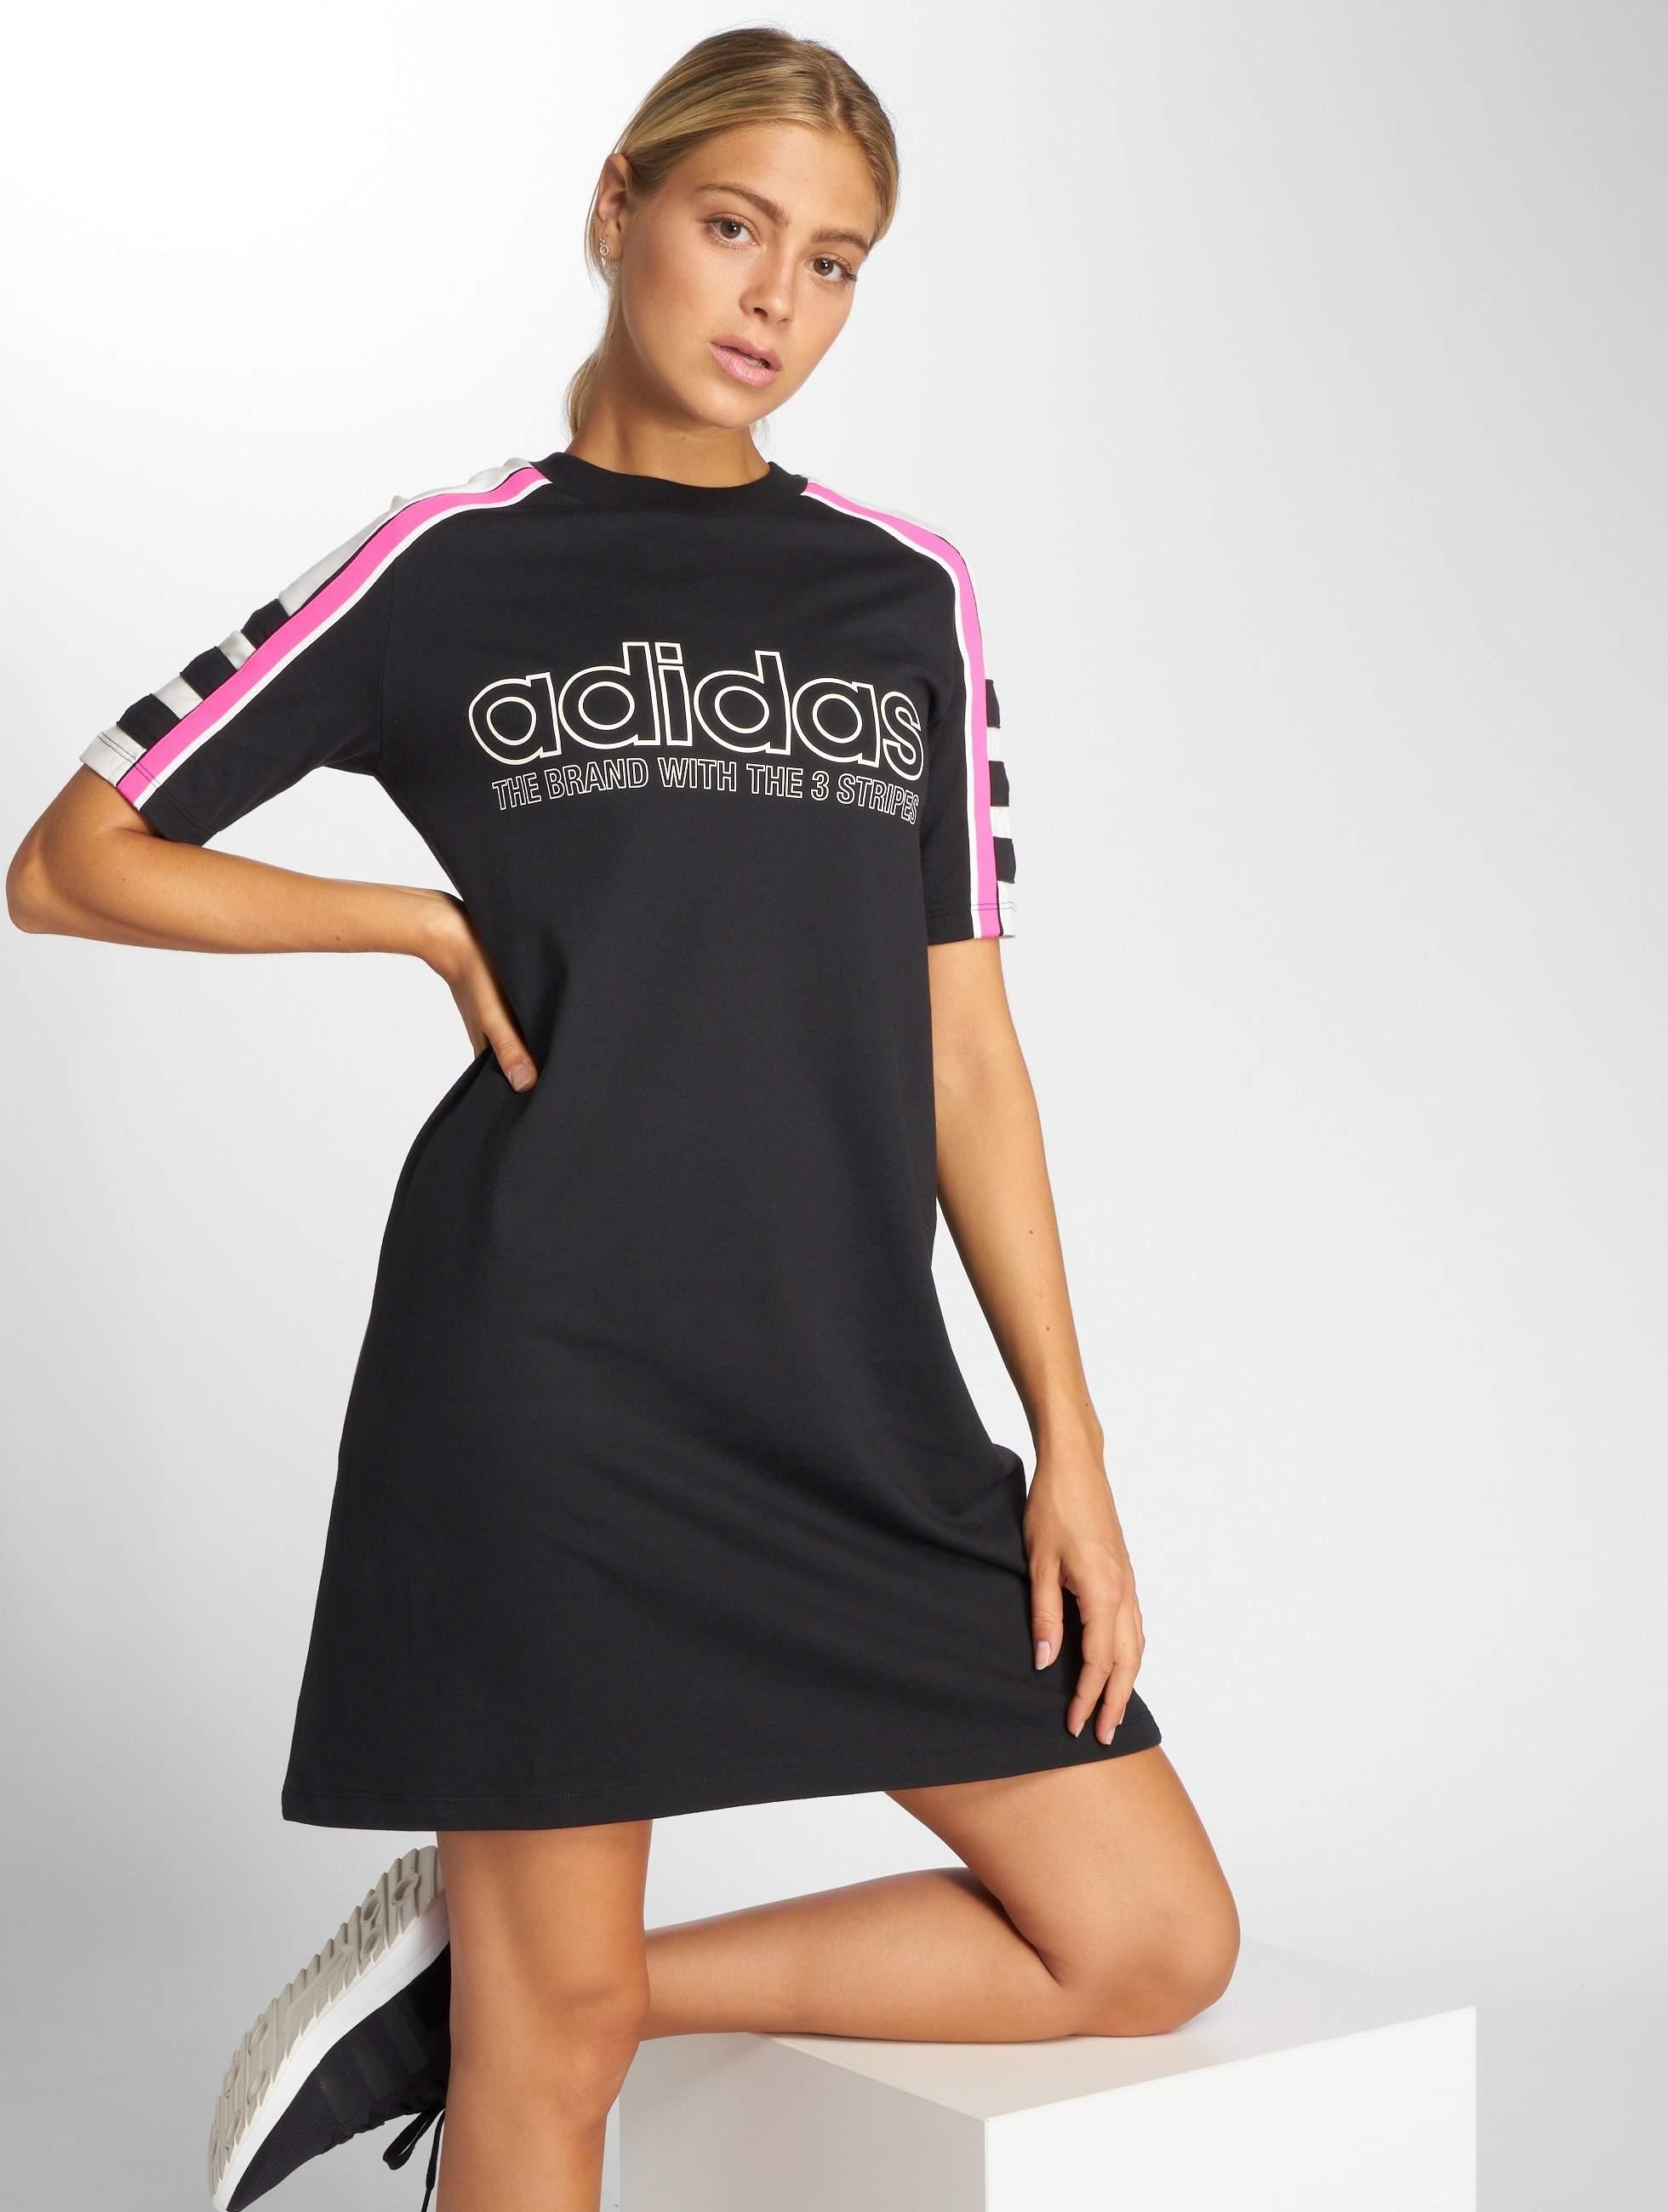 b5194b7c Adidas 499408 I Sort Dress Originals Tee Kjoler 2IEDH9